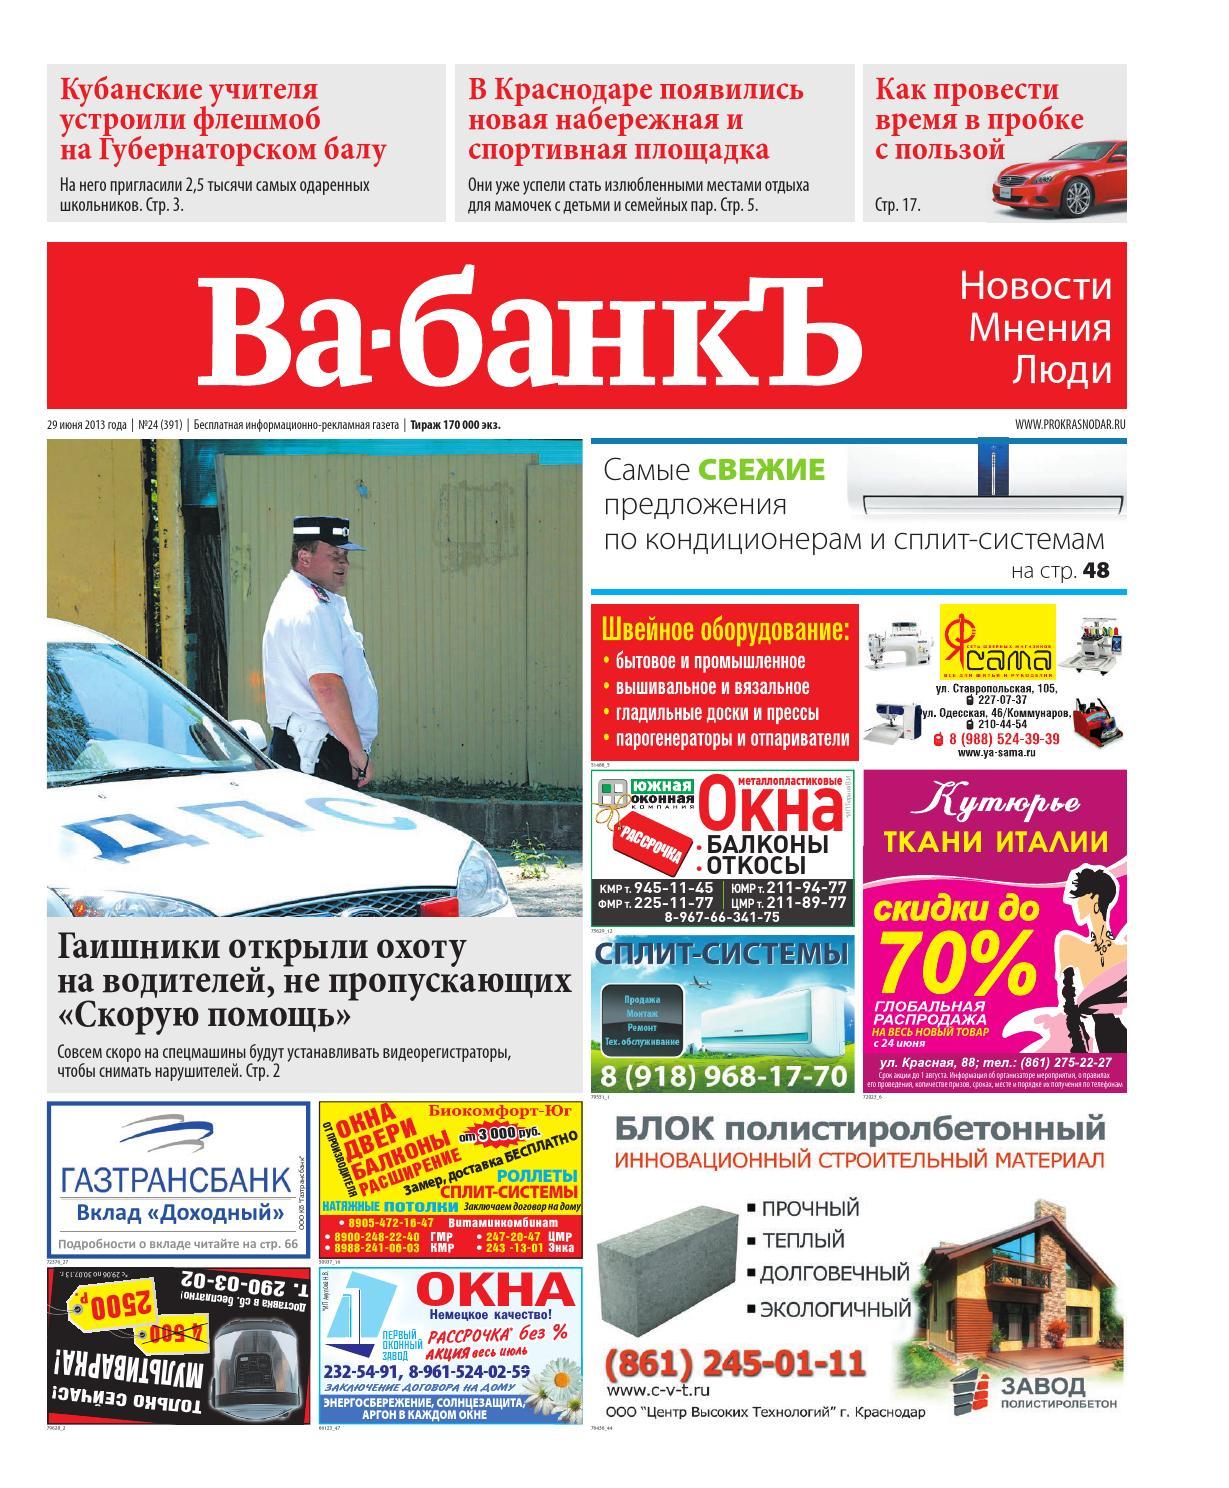 9aea0a8d24a3f Ва-банкъ в Краснодаре. № 391 (от 29 июня 2013 года) by Denis Kartashov -  issuu